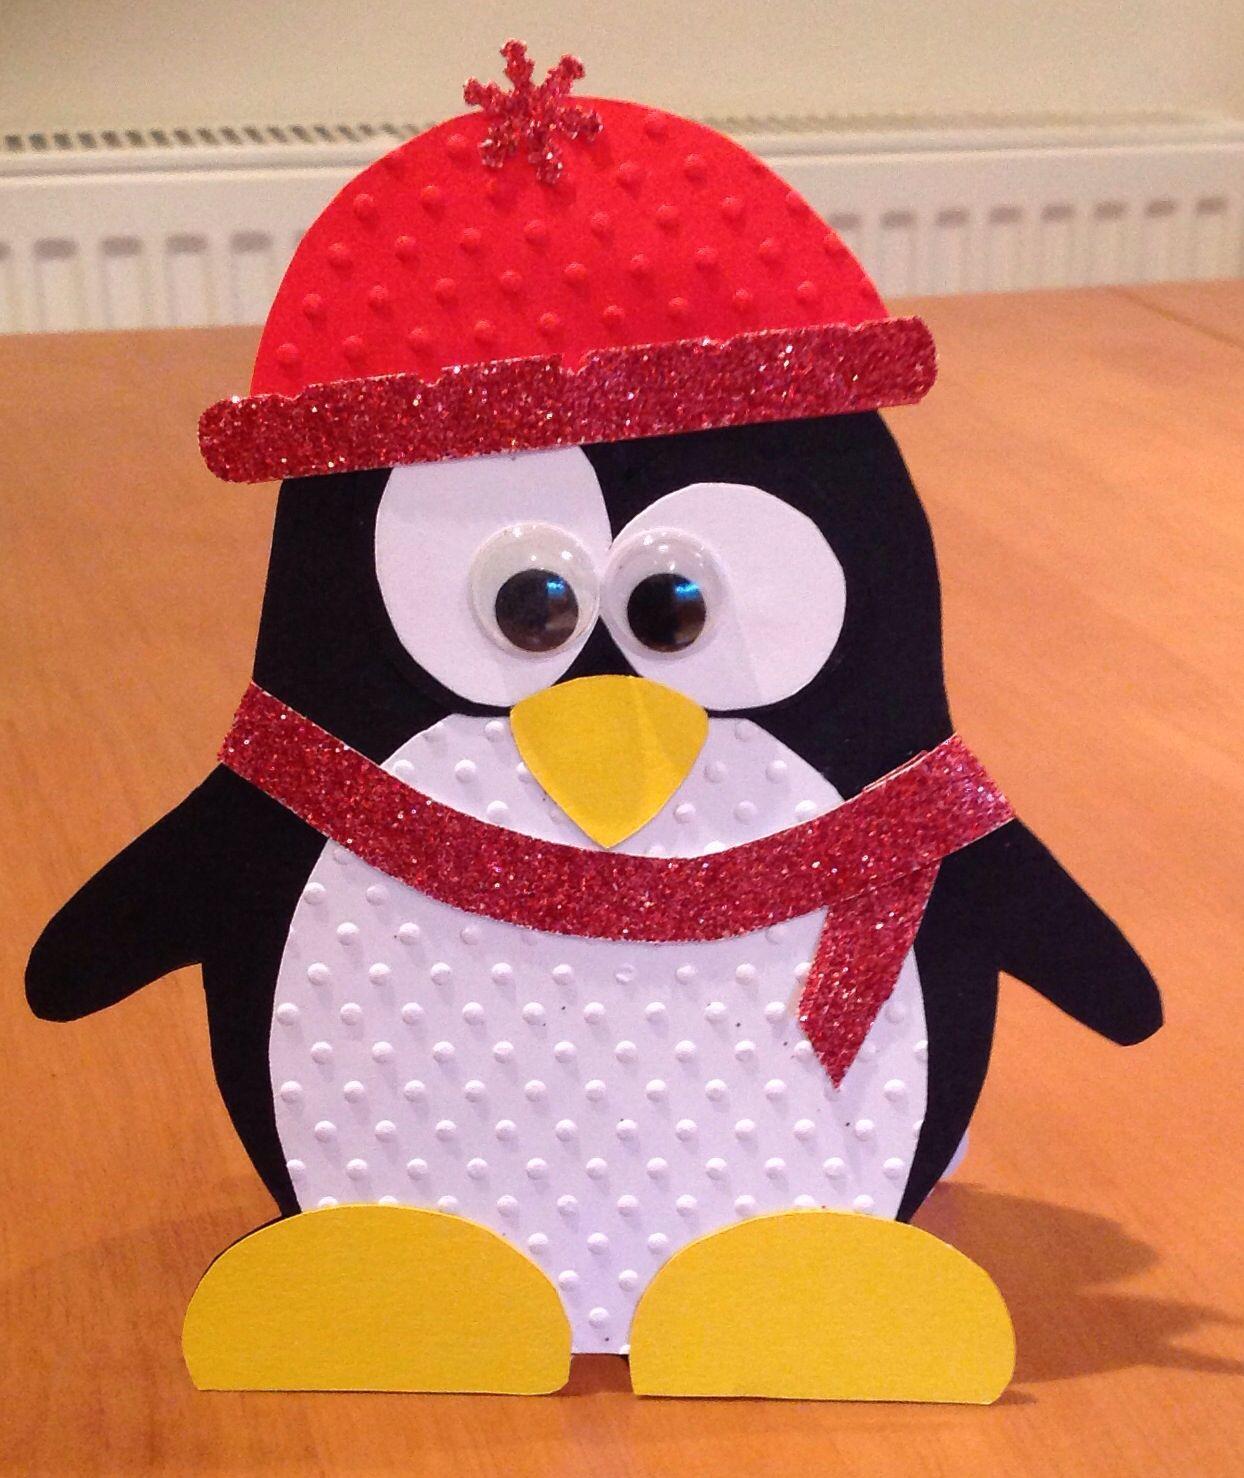 Handmade Penguin CardTemplate From HttpWwwMamadinisCom